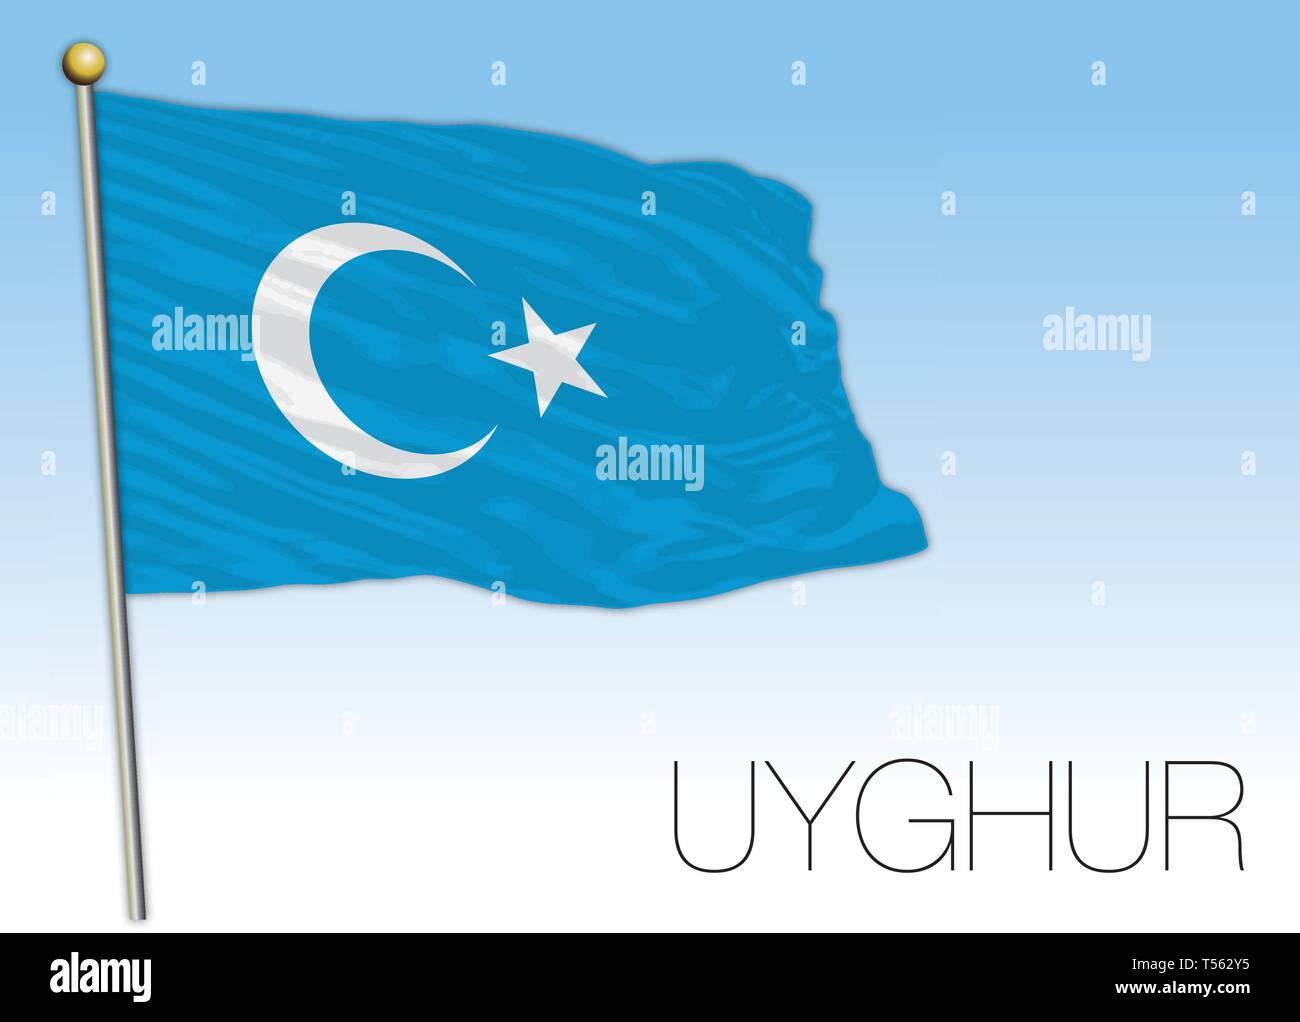 Uyghur nationalism flag, vector illustration - Stock Vector